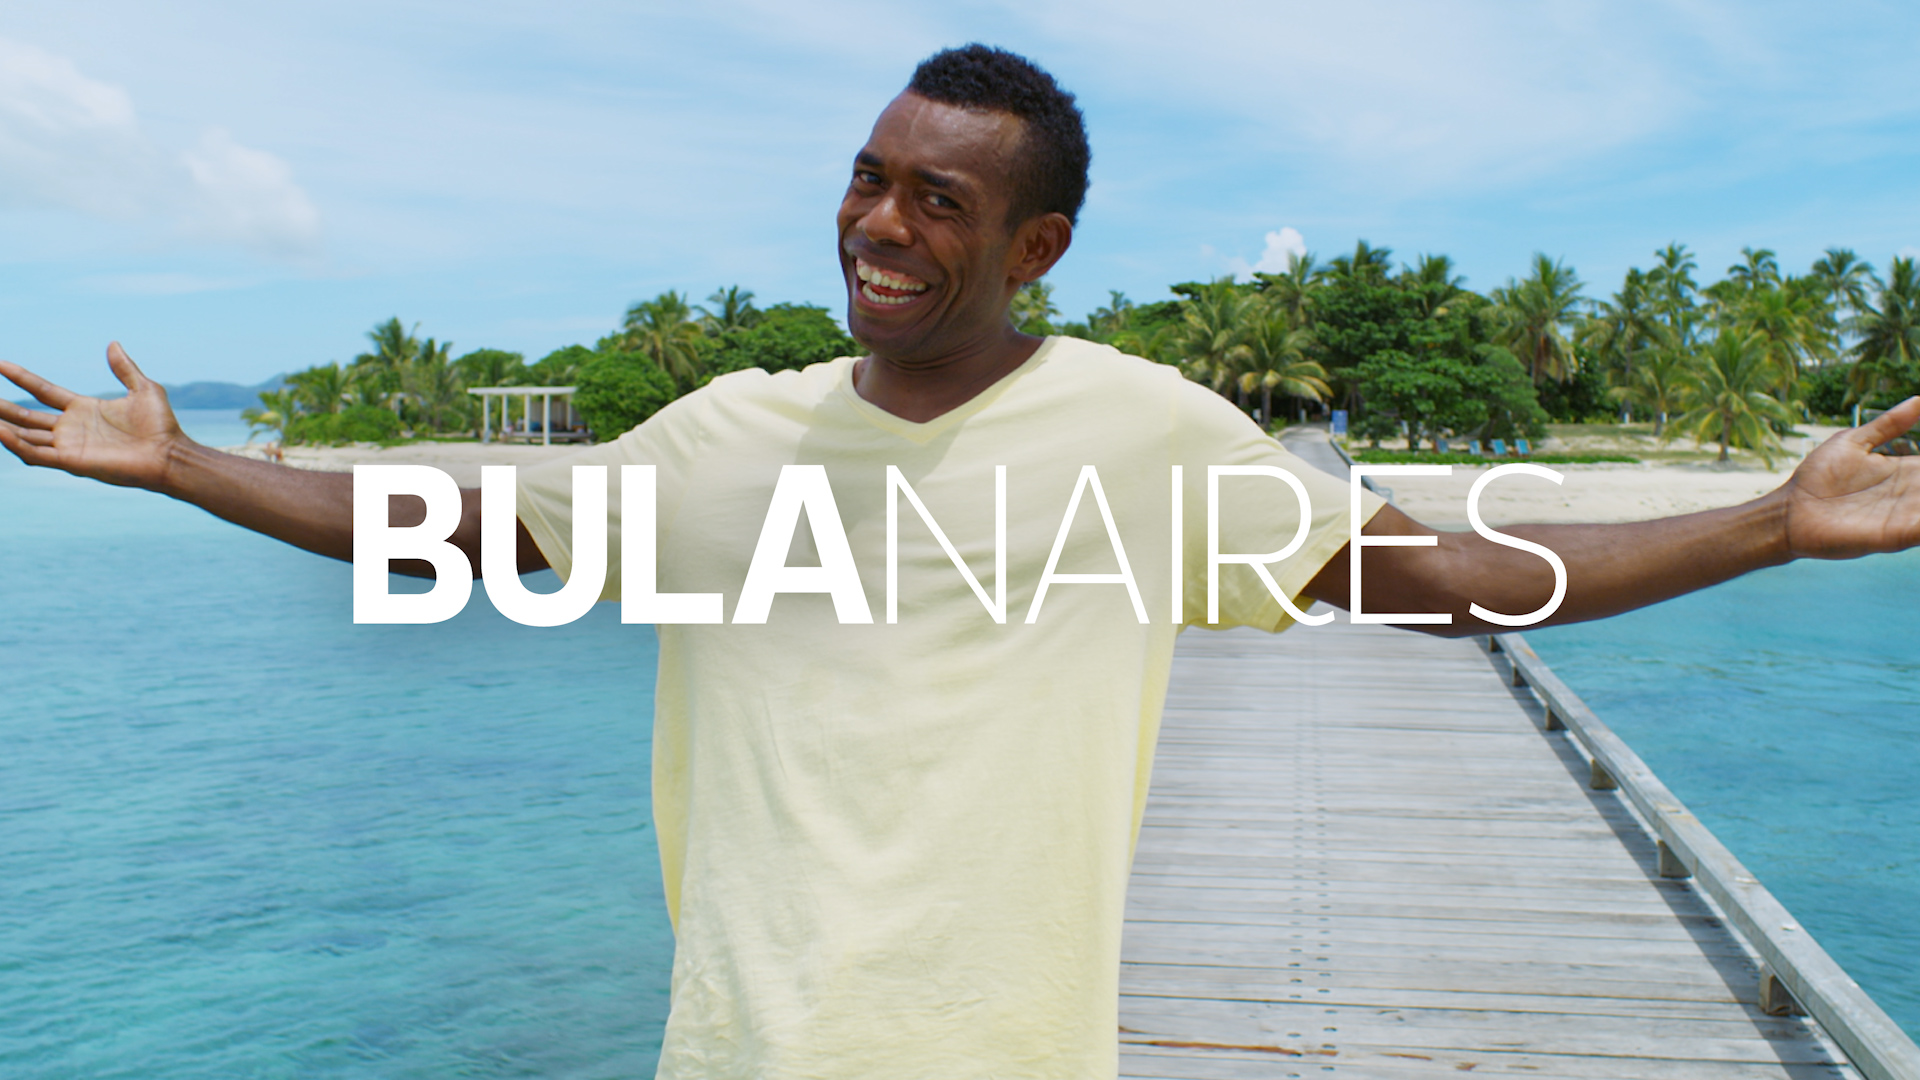 THIS. Film Studio Reveals 'Bulanaires' Campaign For Tourism Fiji